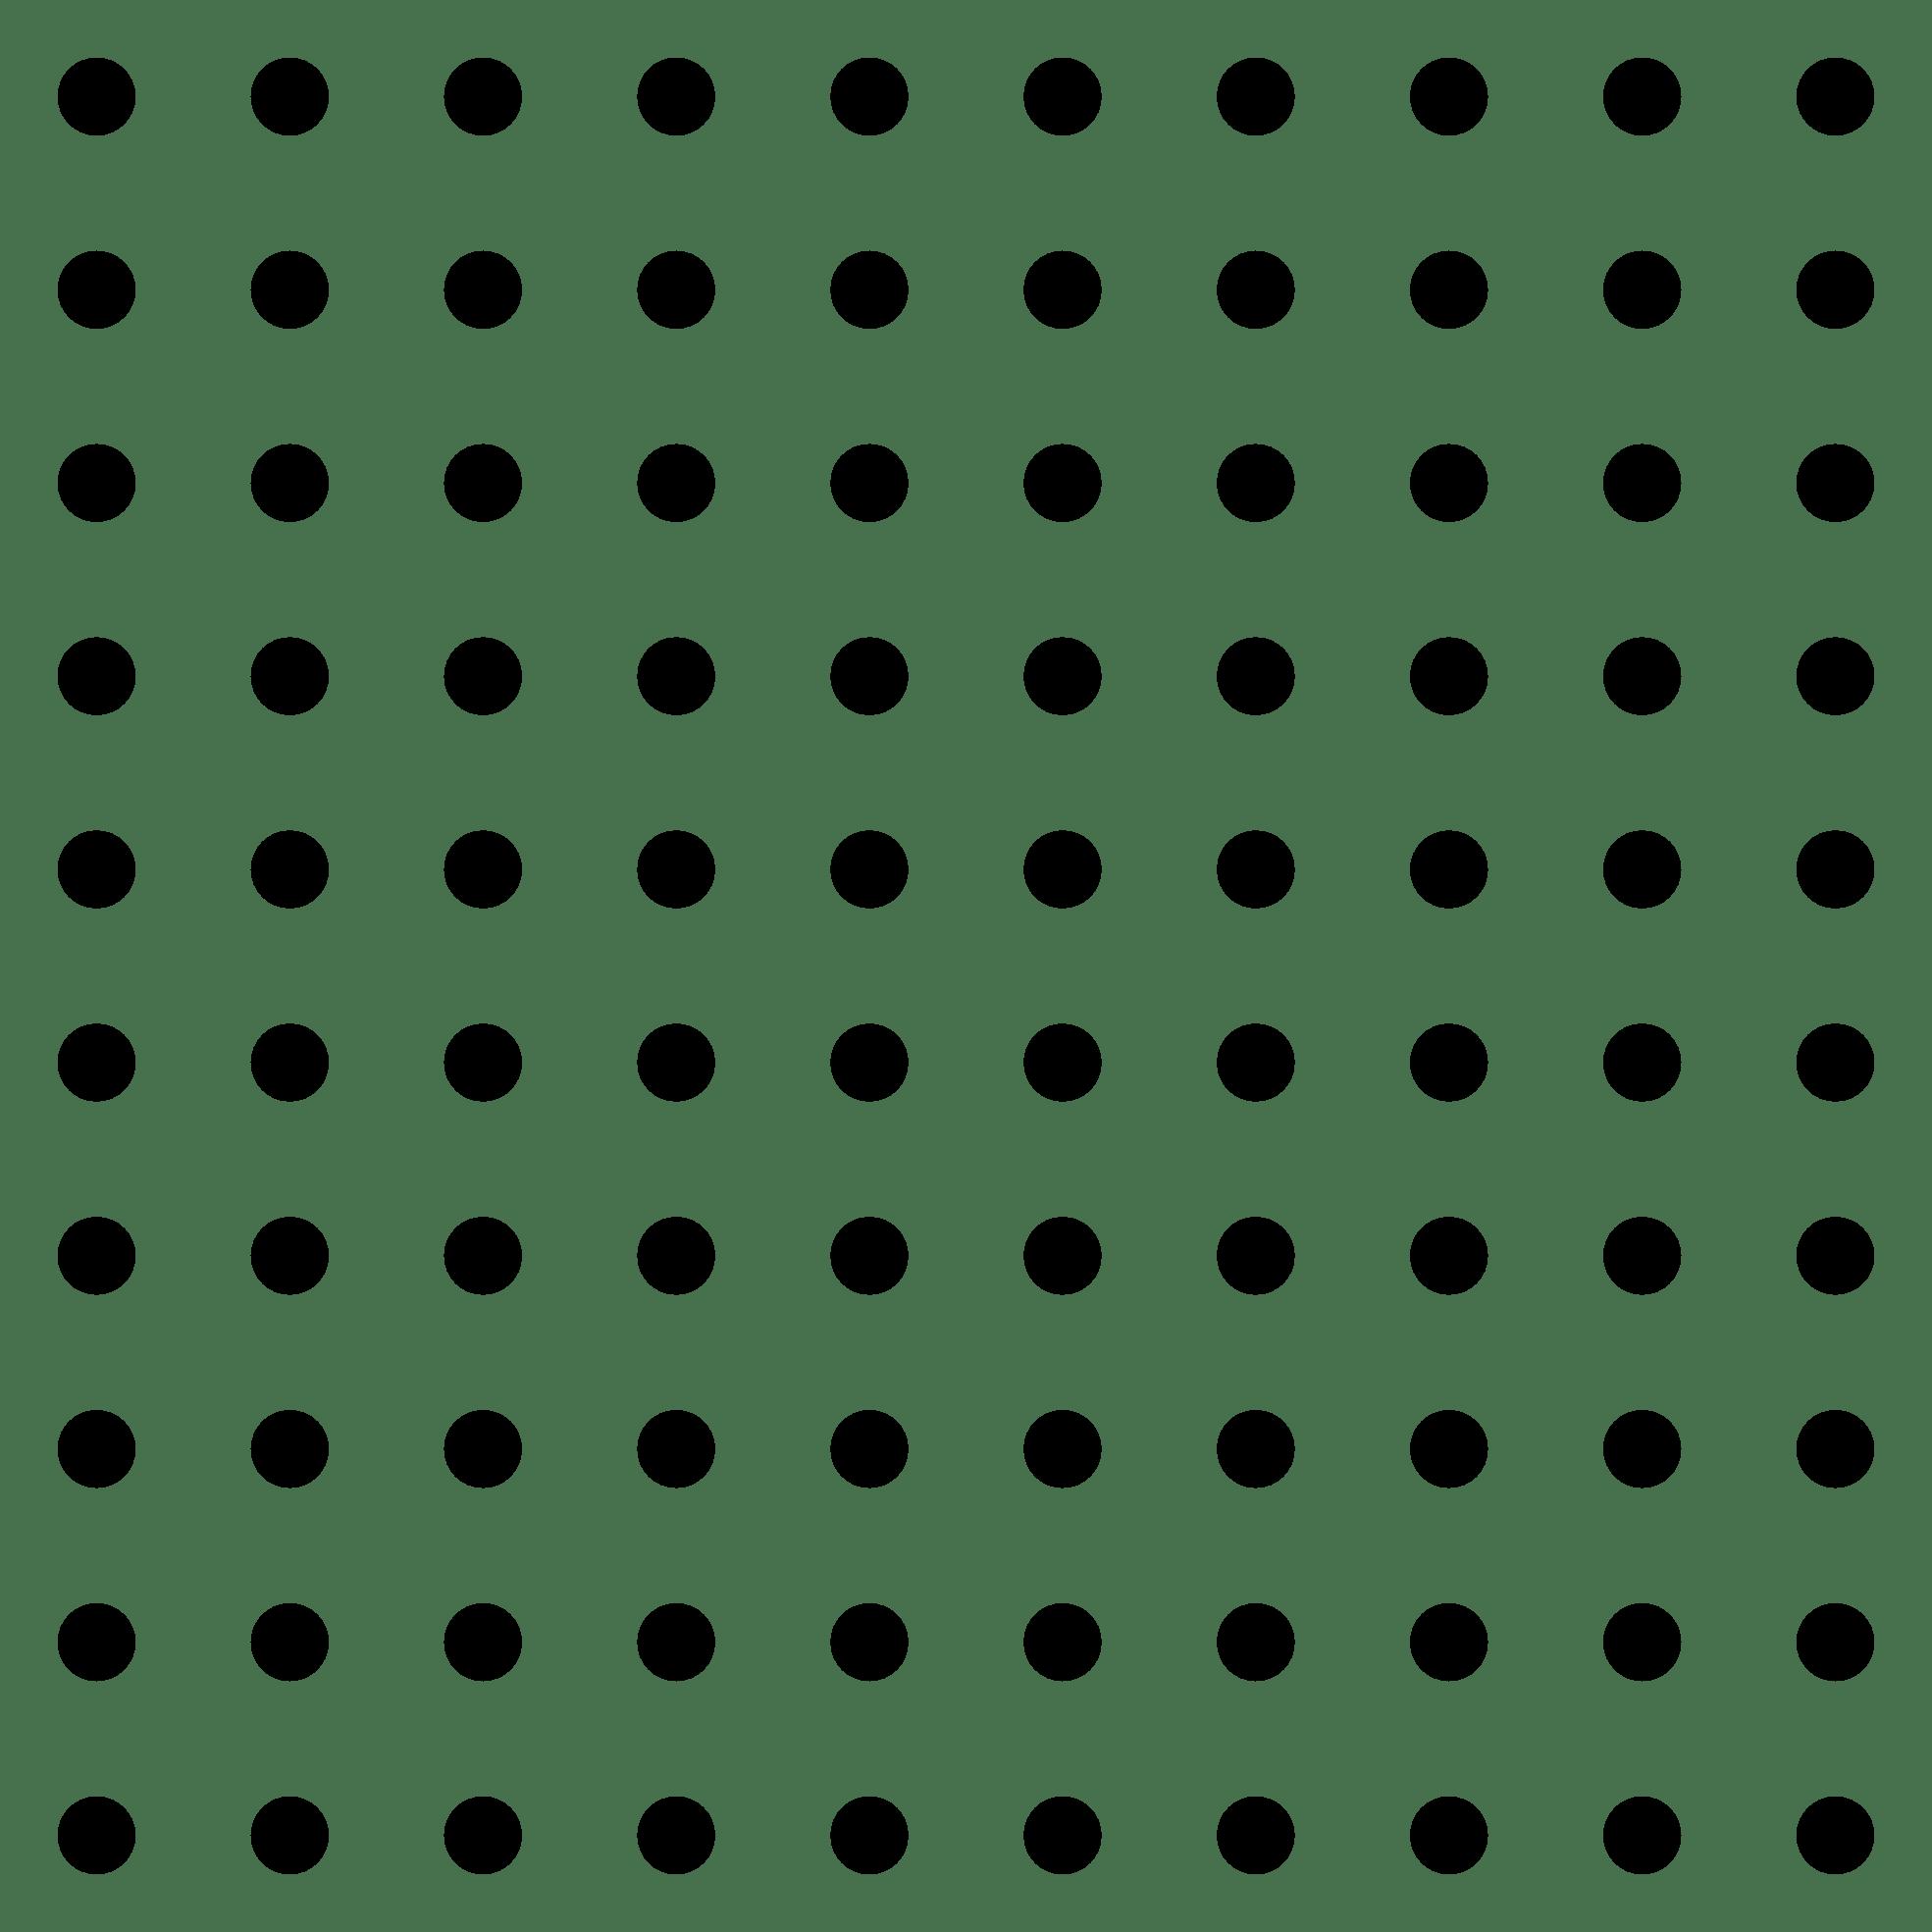 Pattern Clip Art Free Clipart Panda